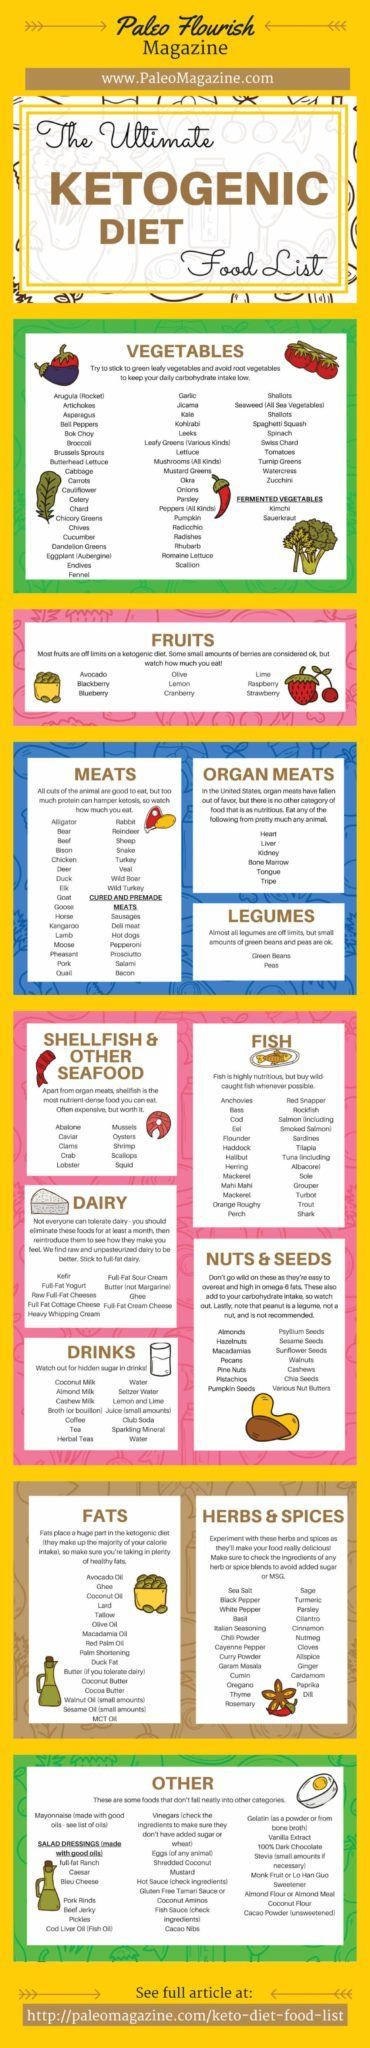 Keto Diet Food List: 221 Foods to Boost Energy (+ Printable Cheat Sheet)